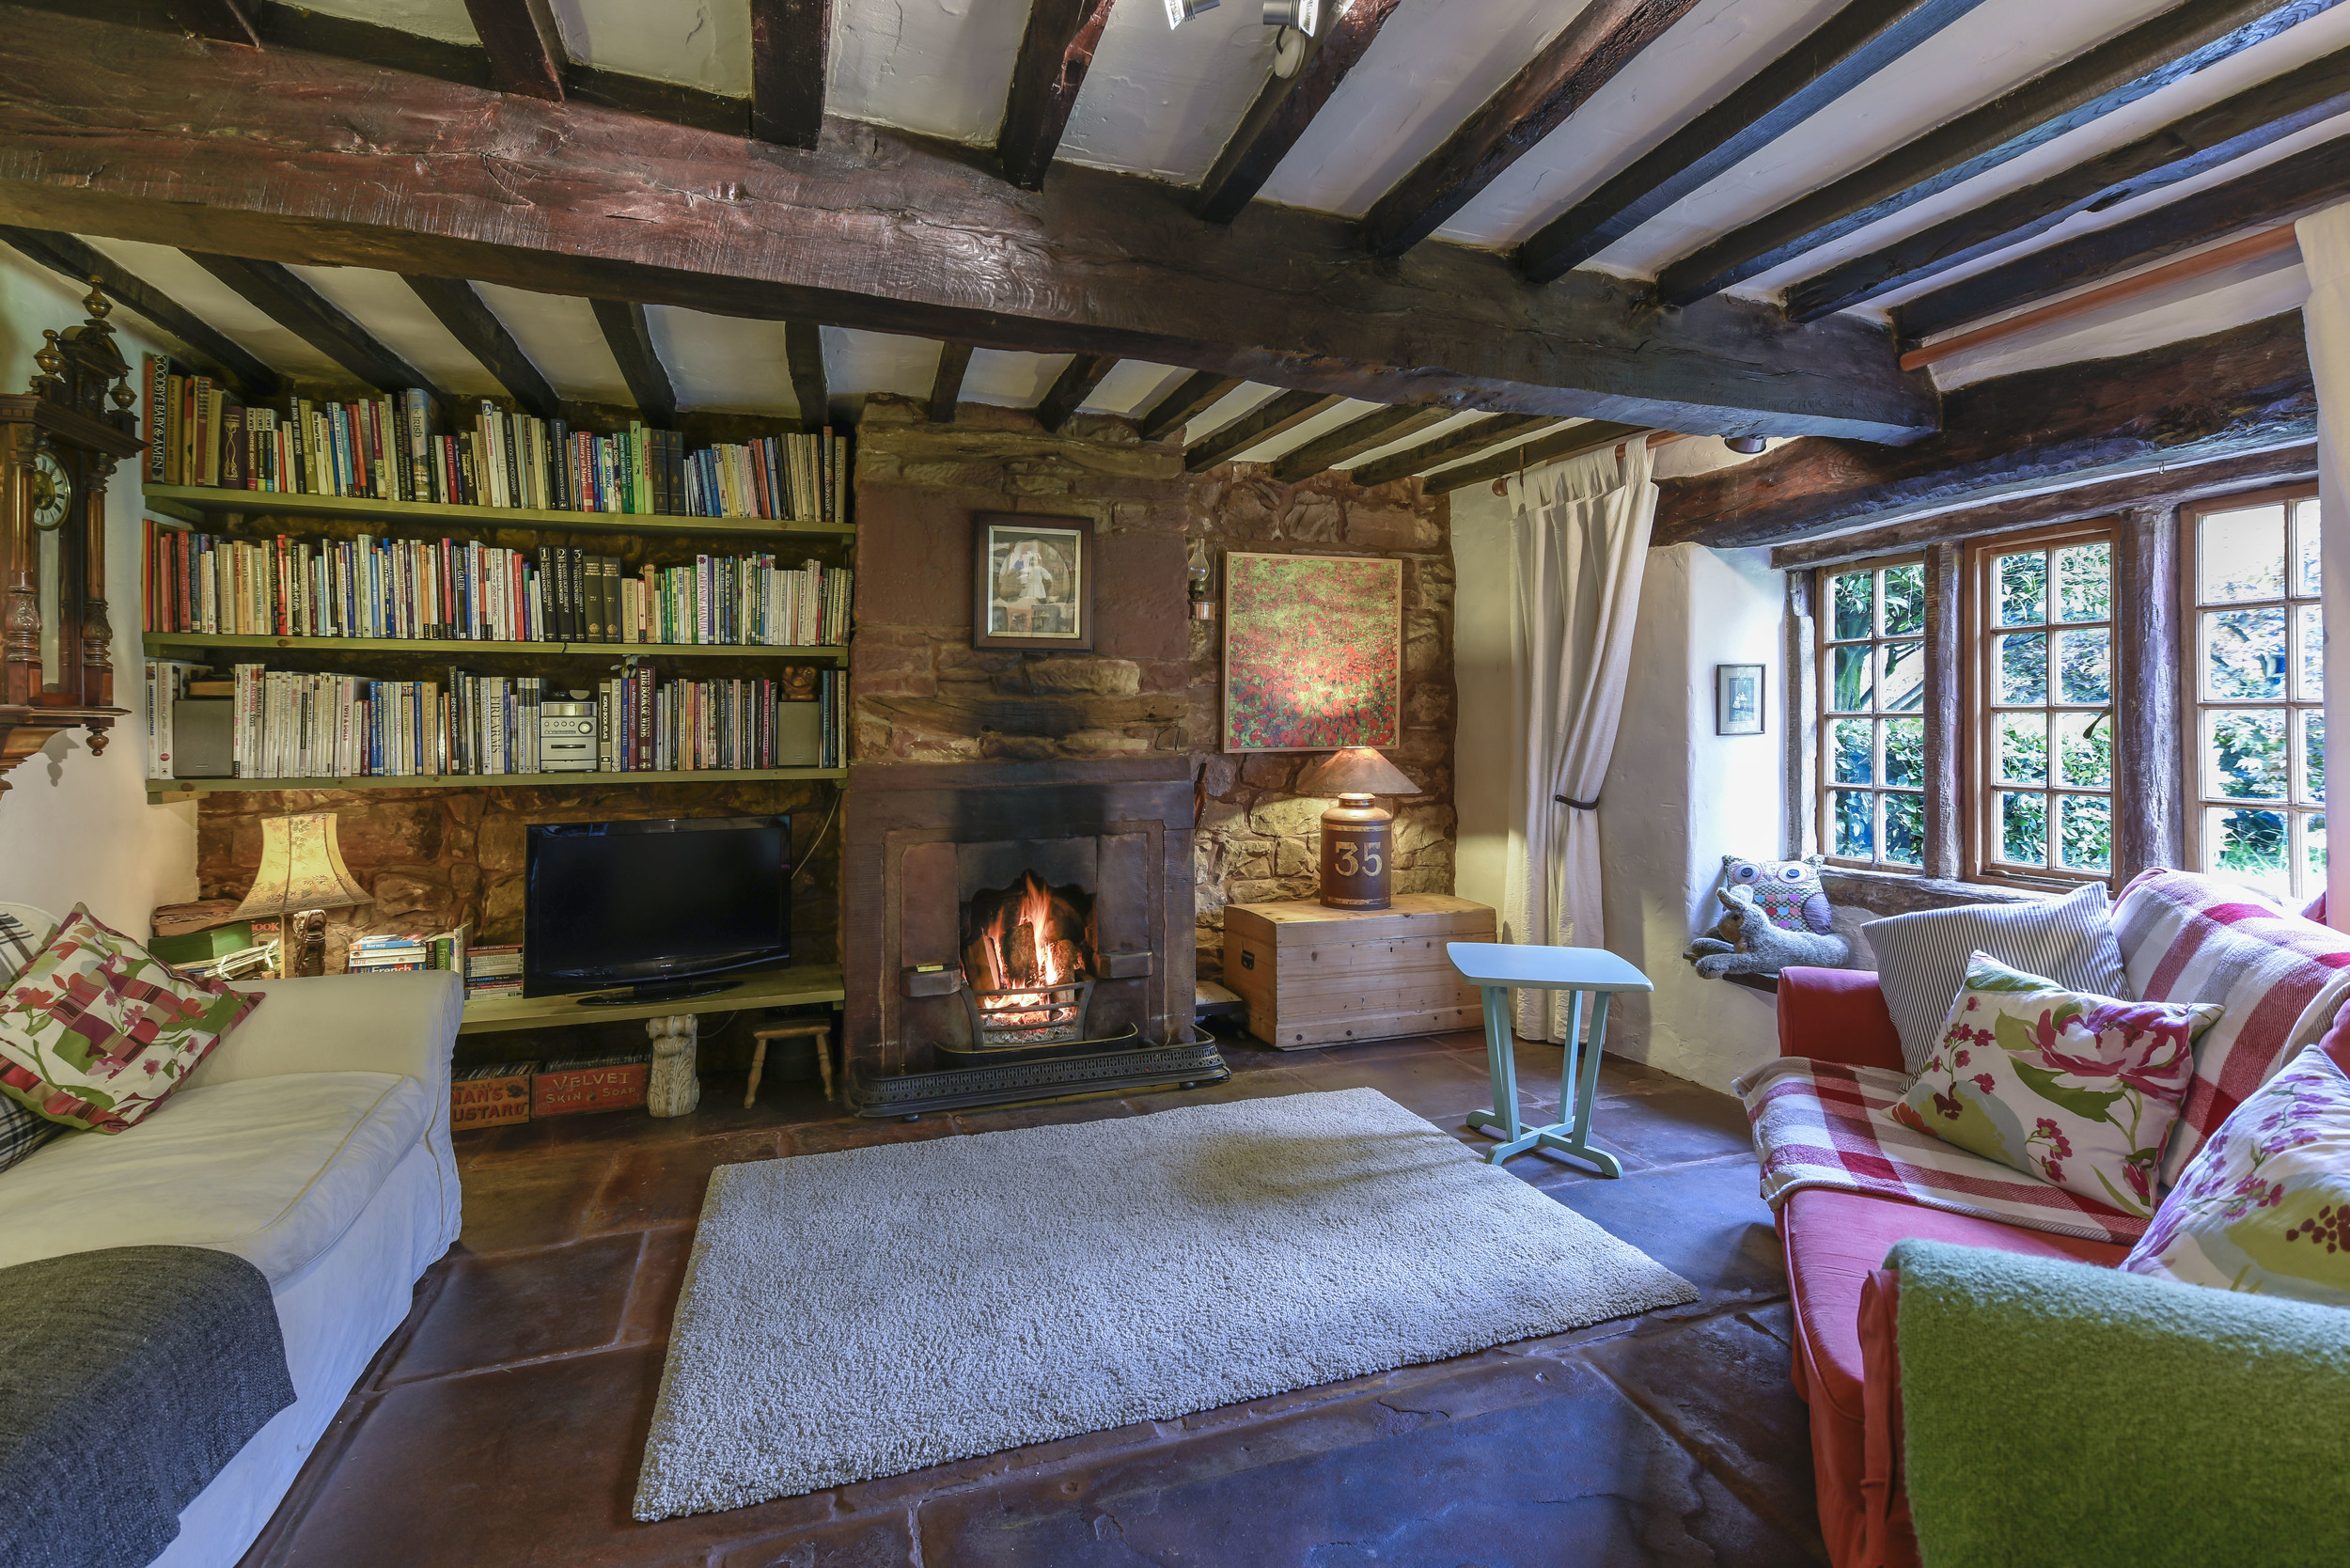 Kirkland_Hall_Cottages-5.jpg